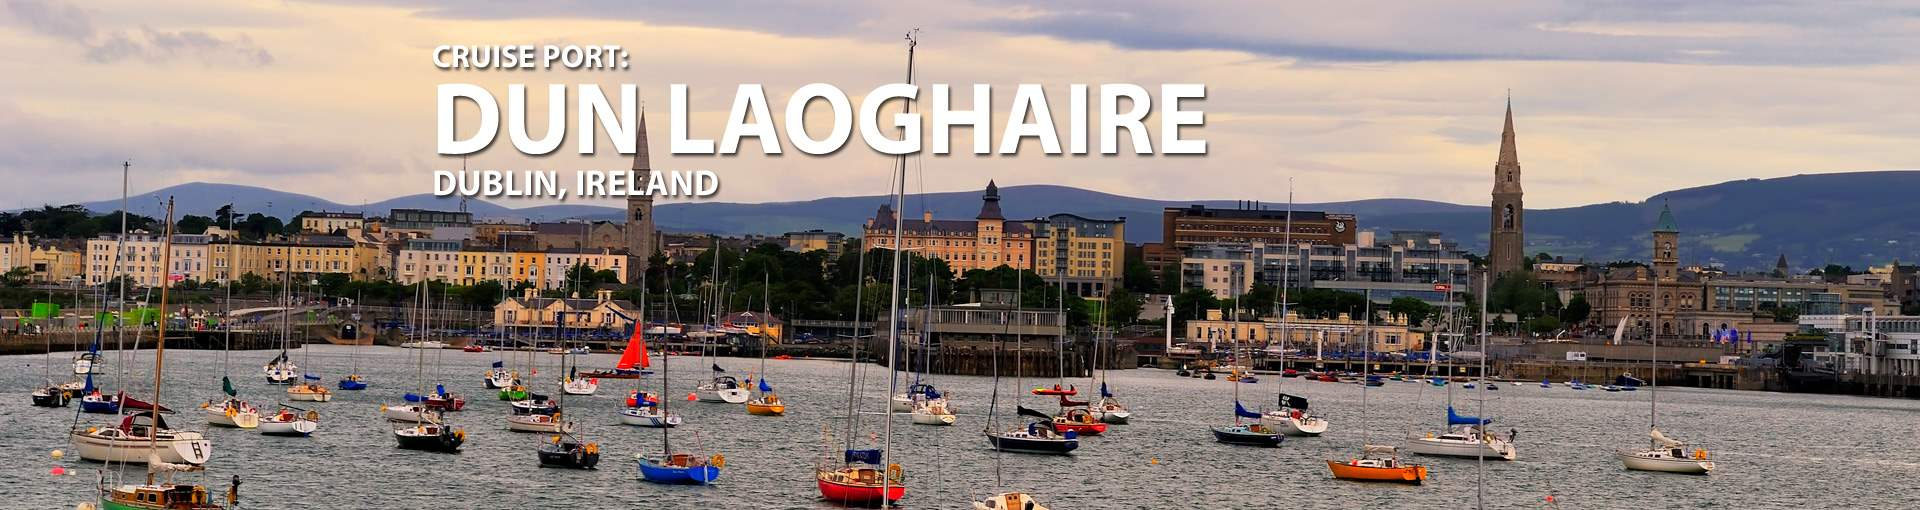 Cruises to Dun Laoghaire, Dublin, Ireland